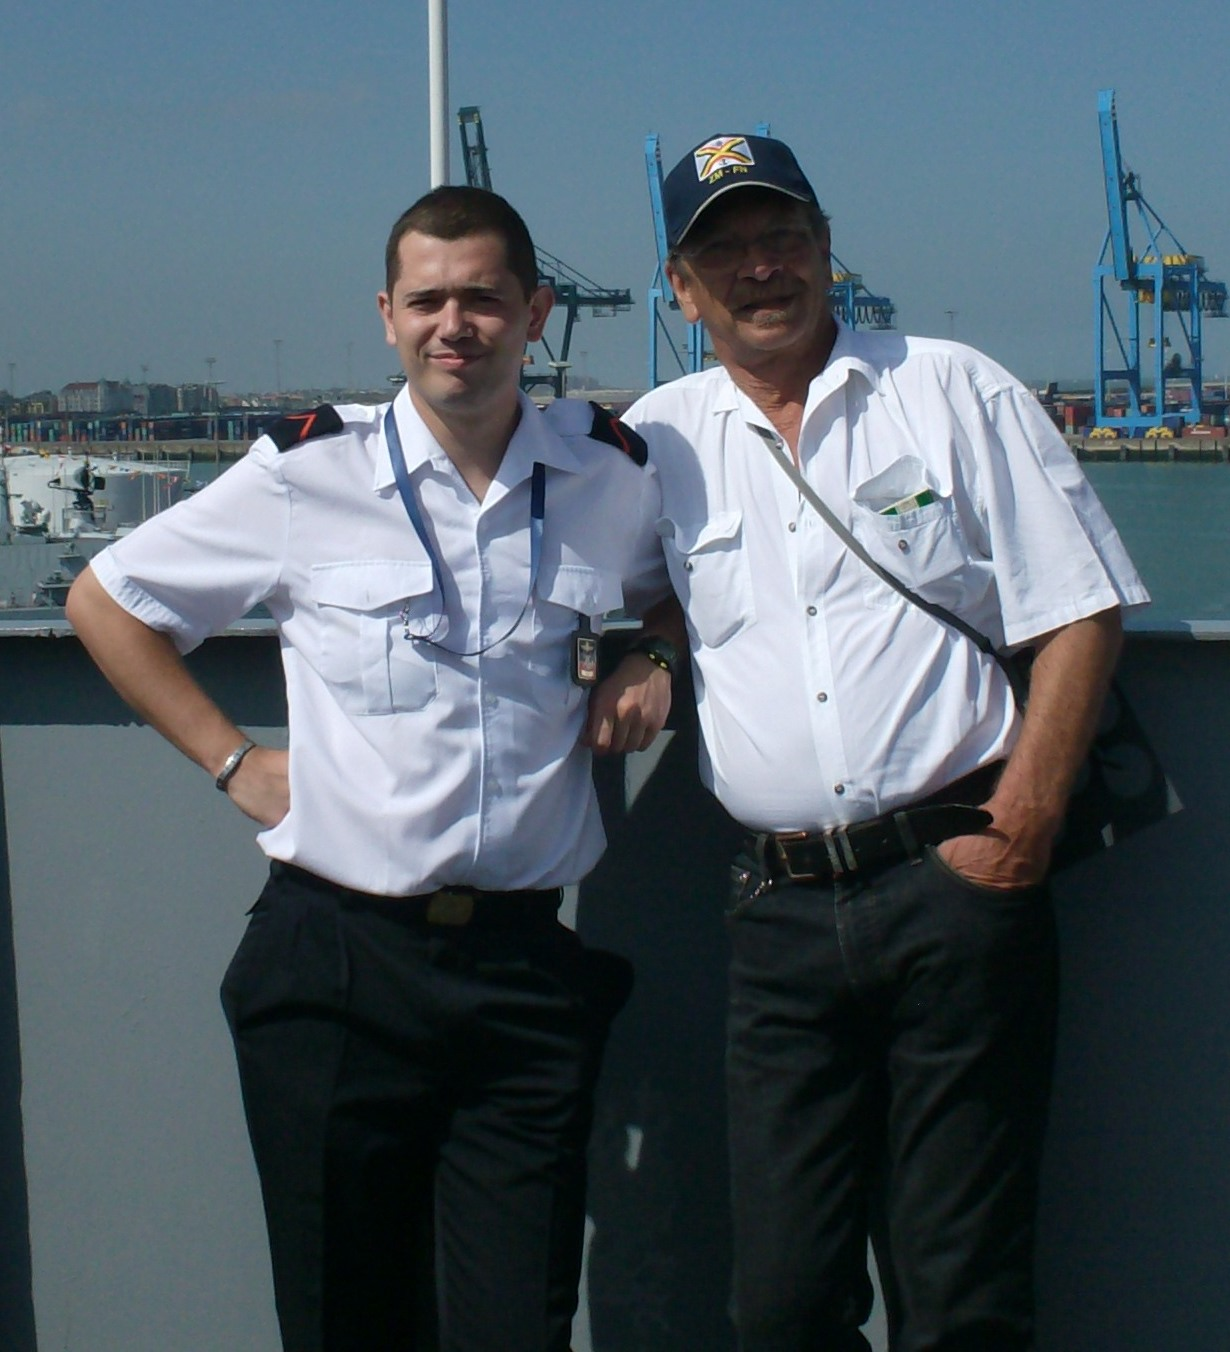 Vos photos du Navy Day 03&04/07/2010  - Page 2 511856HPIM1445